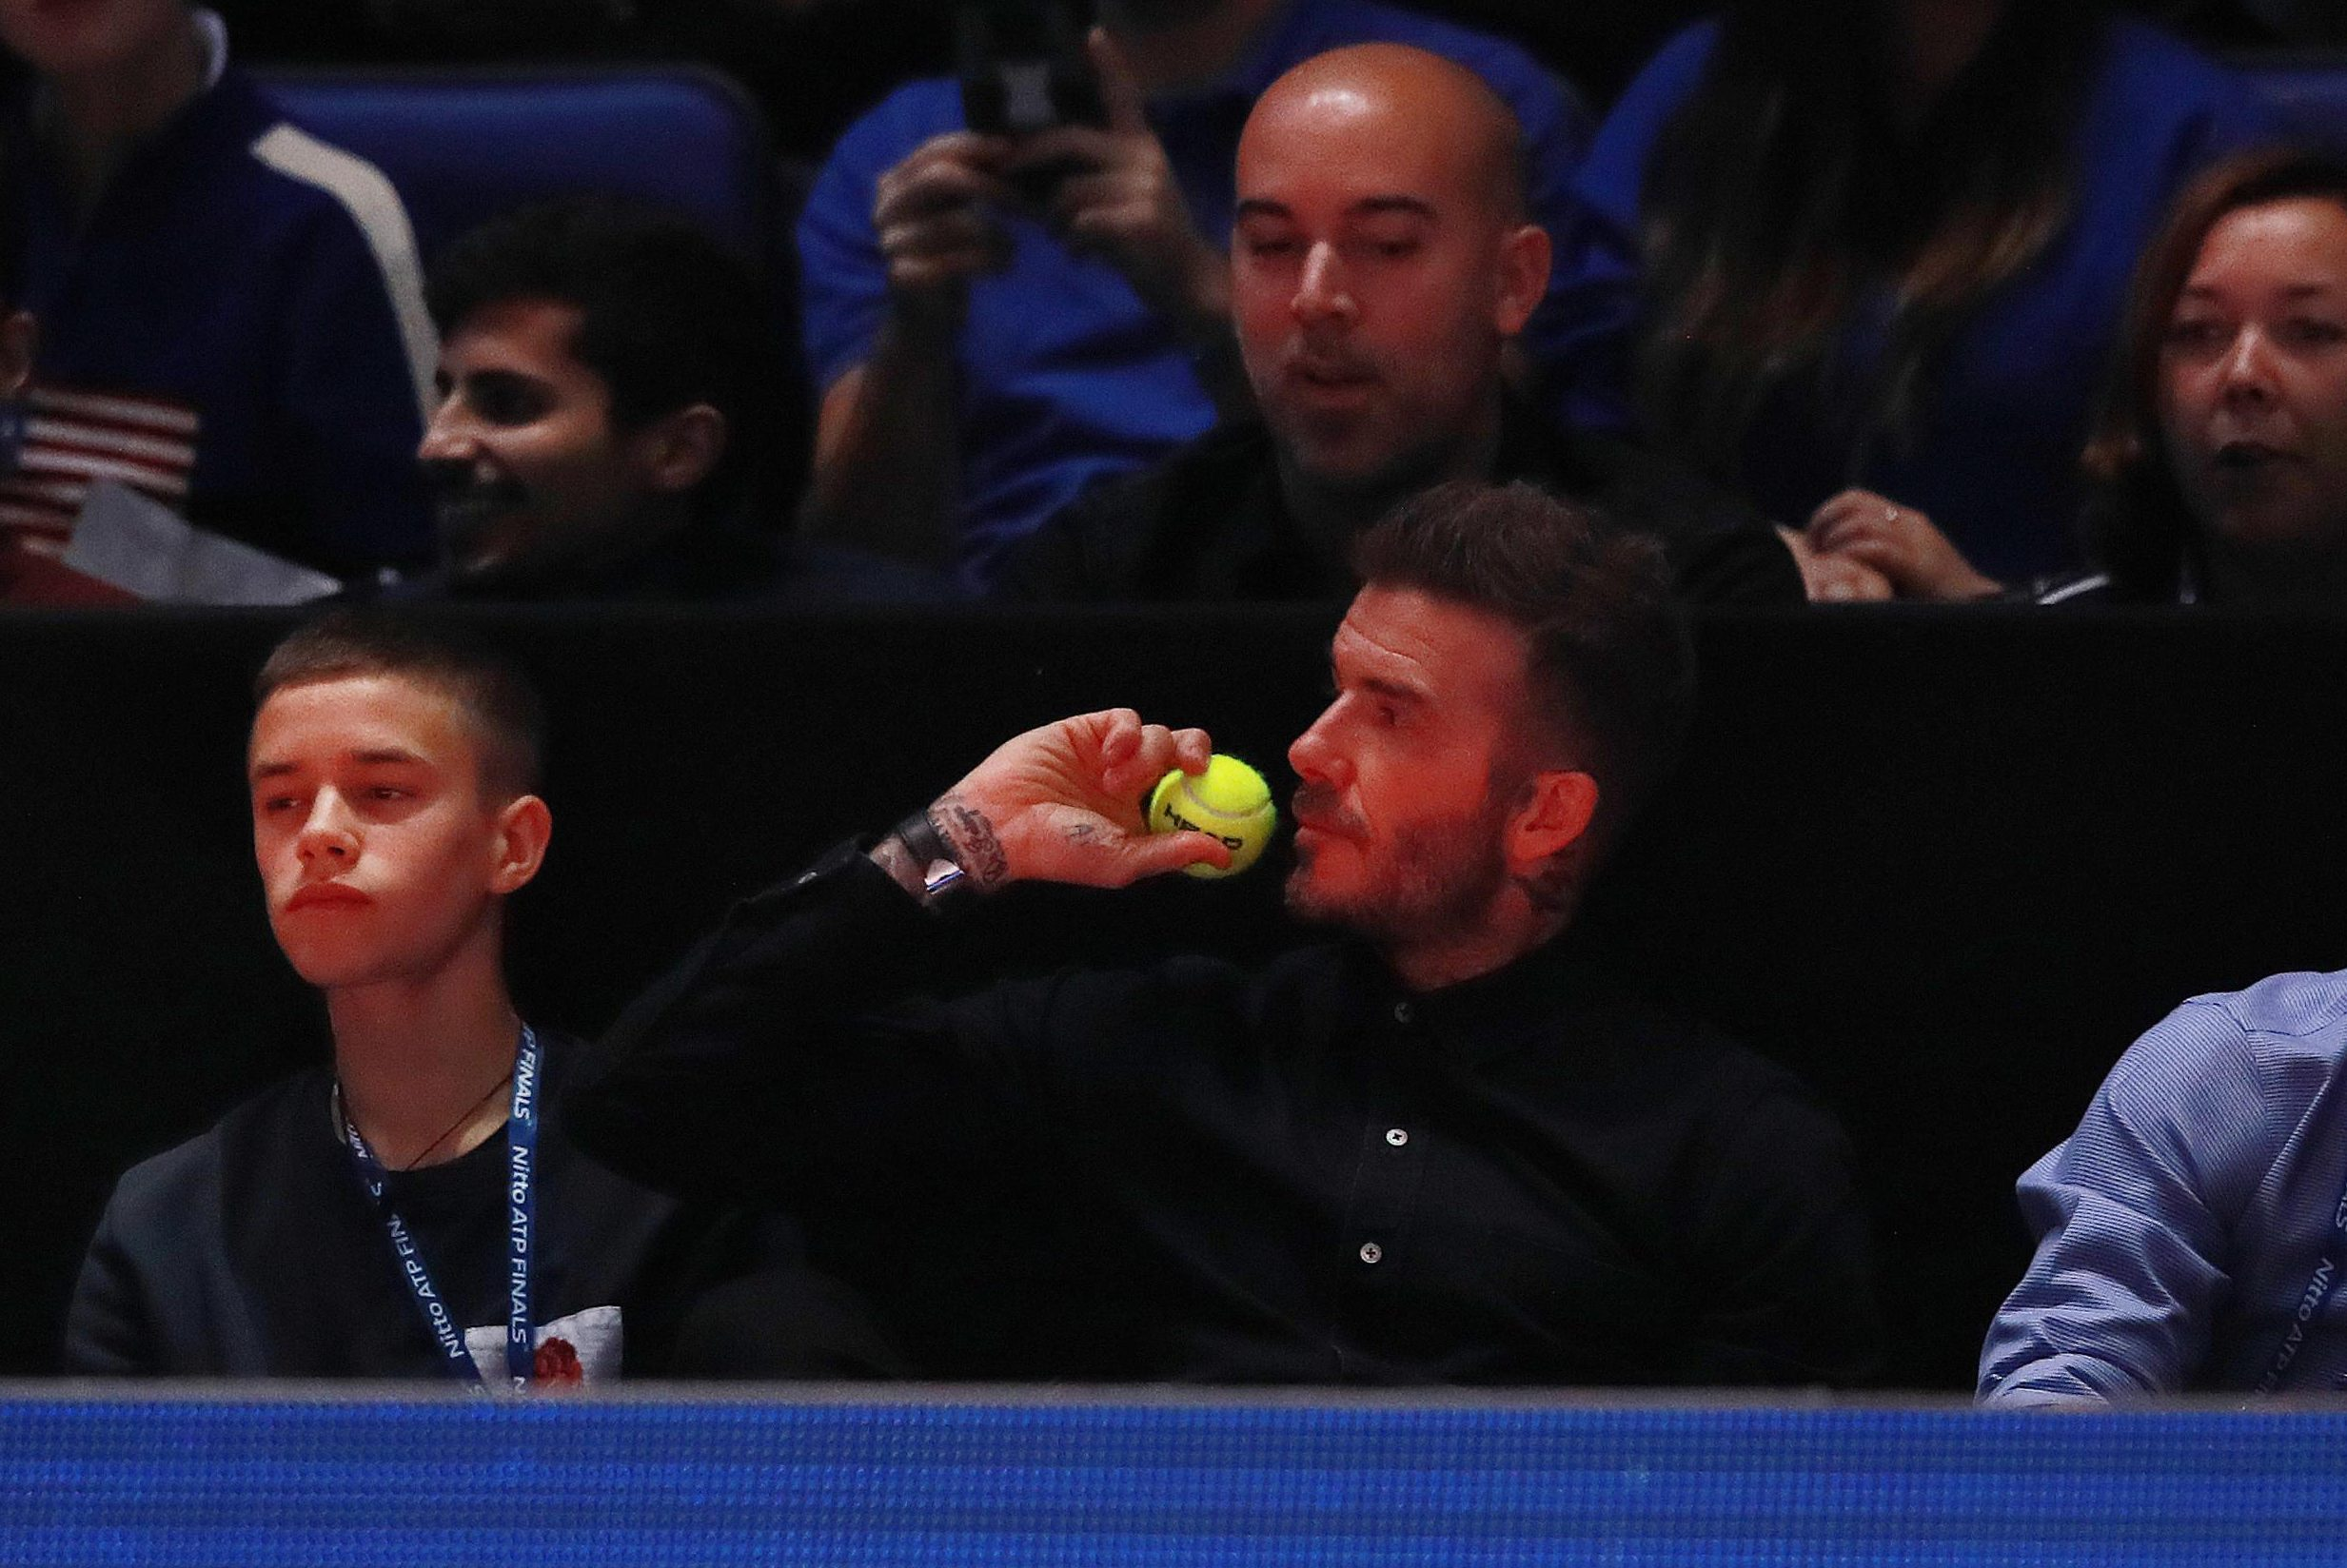 David Beckham goes from England skipper to ball boy as he enjoyed a memorable evening for Alexander Zverev against Novak Djokovic